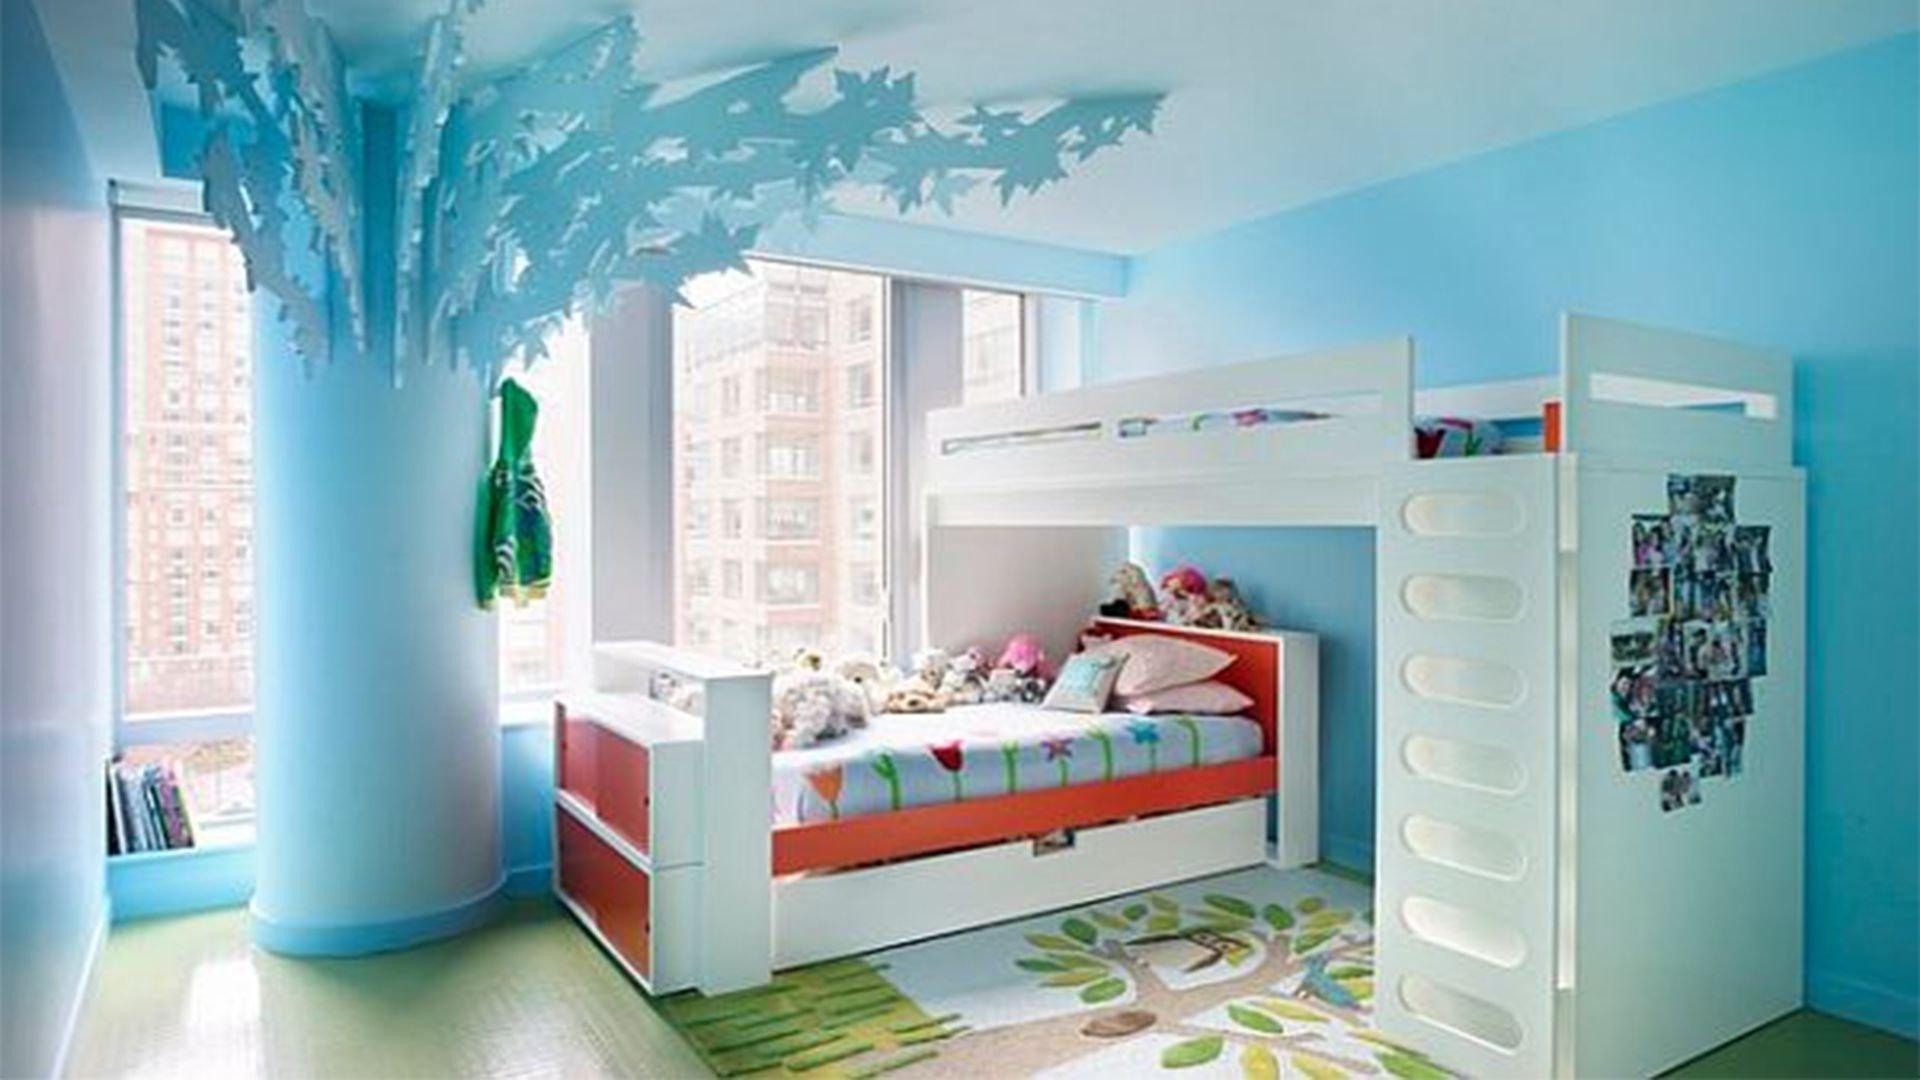 10 Stylish Cool Room Ideas For Teenage Girls cool designs for teenage girl bedroom bedroom wallpaper high 2 2020